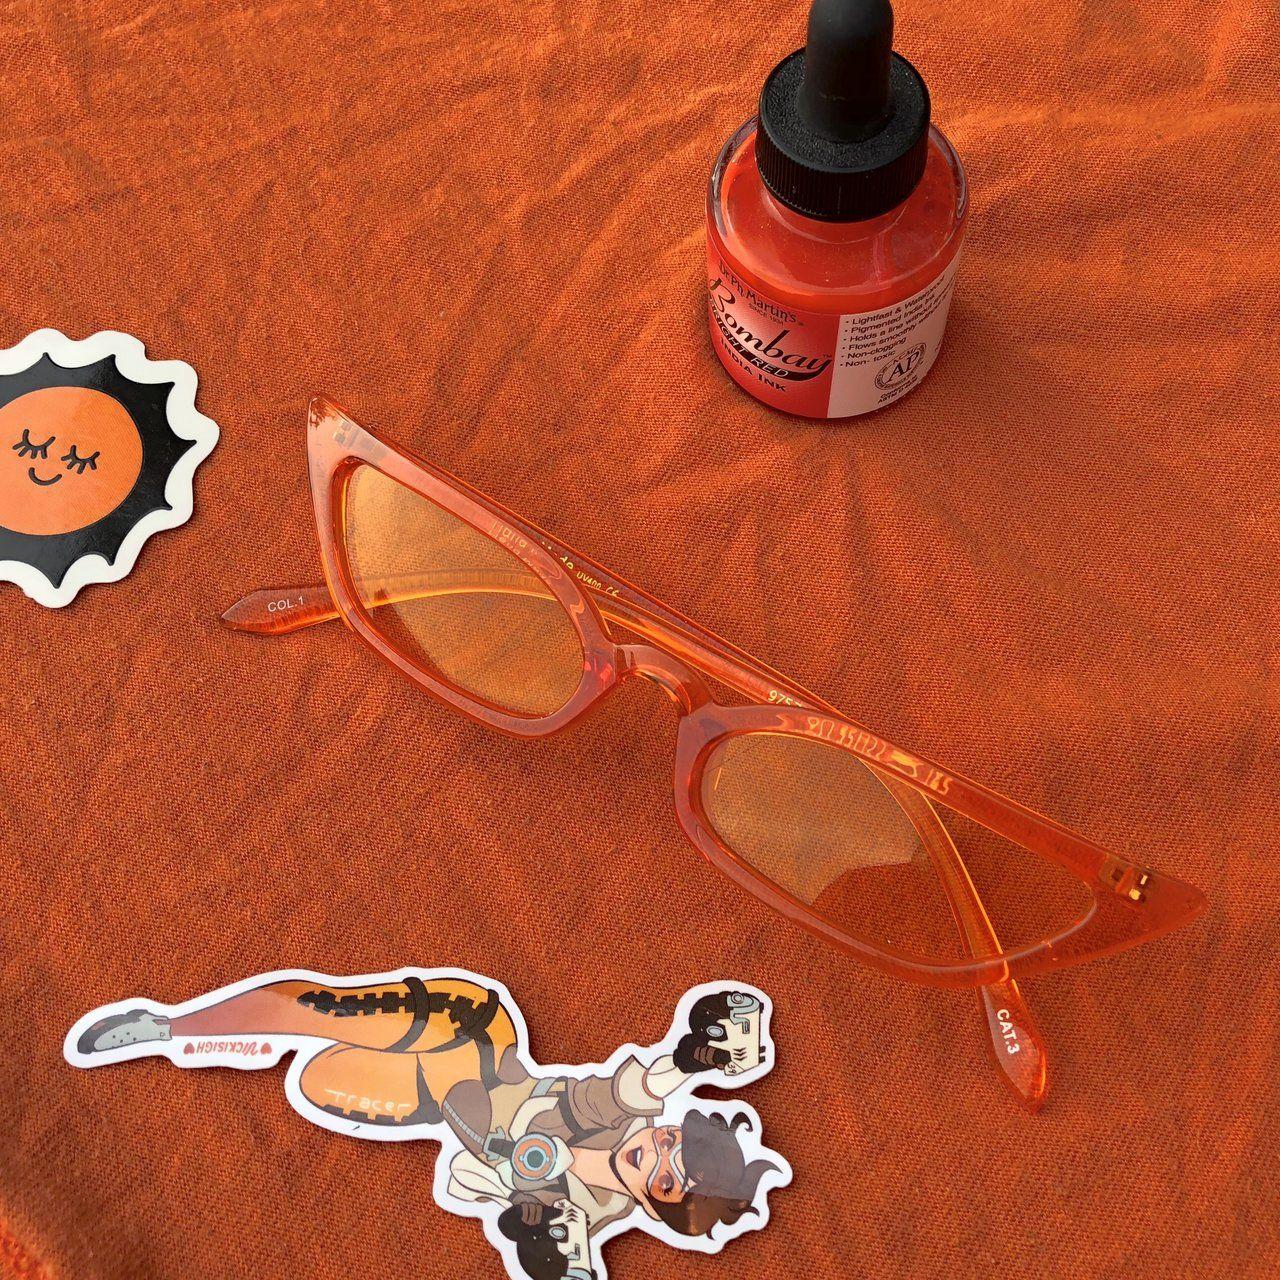 3c6ea98cb6cb4 Asuka. Slim thin tiny transparent cateye sunglasses in 🔥 - Depop ...